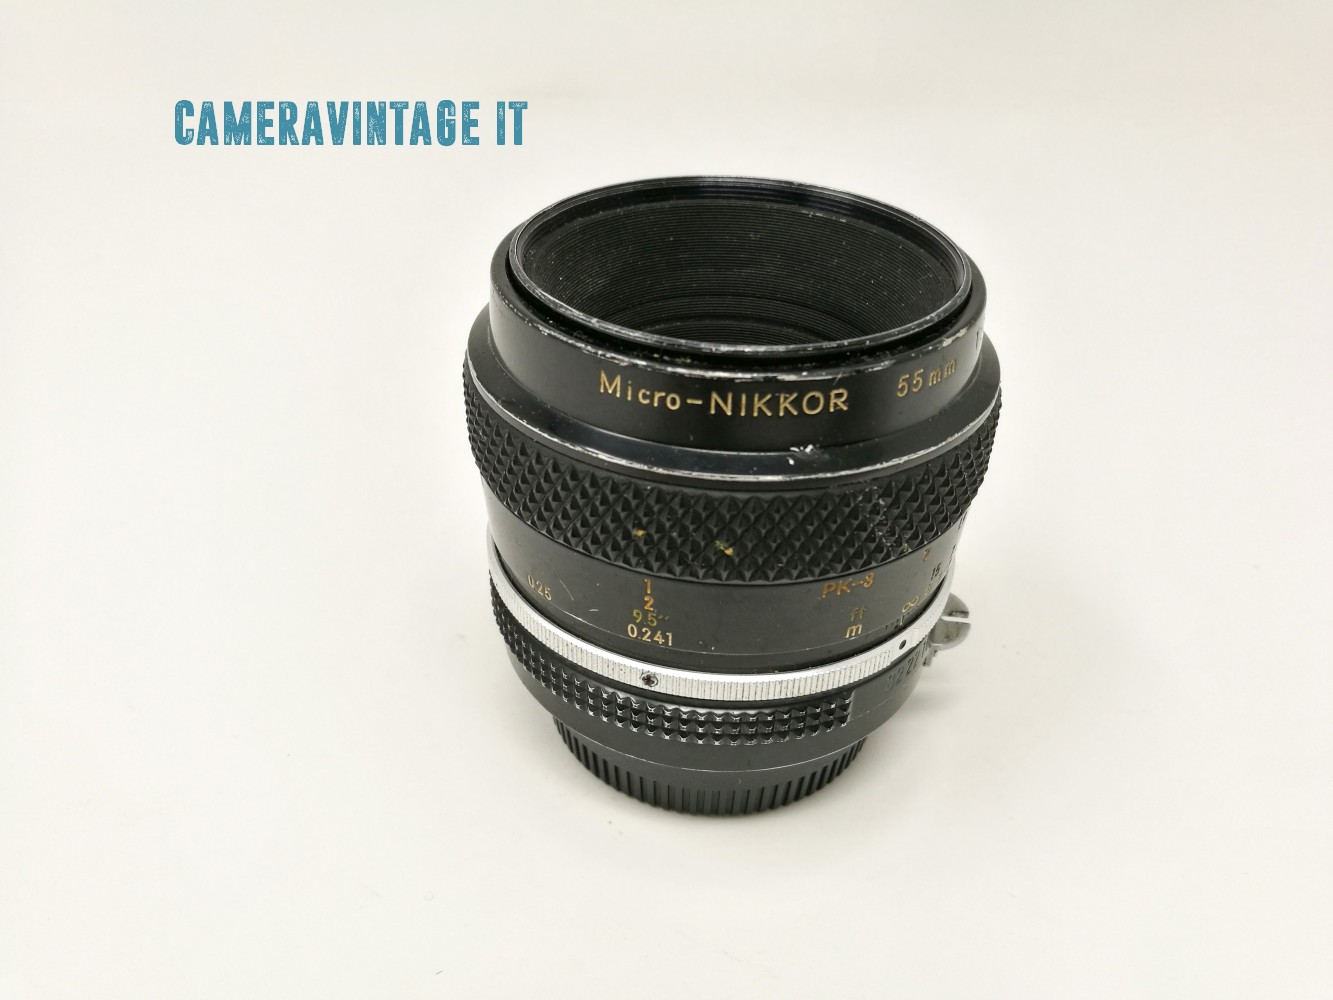 NIKONMICRO-NIKKOR 55mm f/3,5